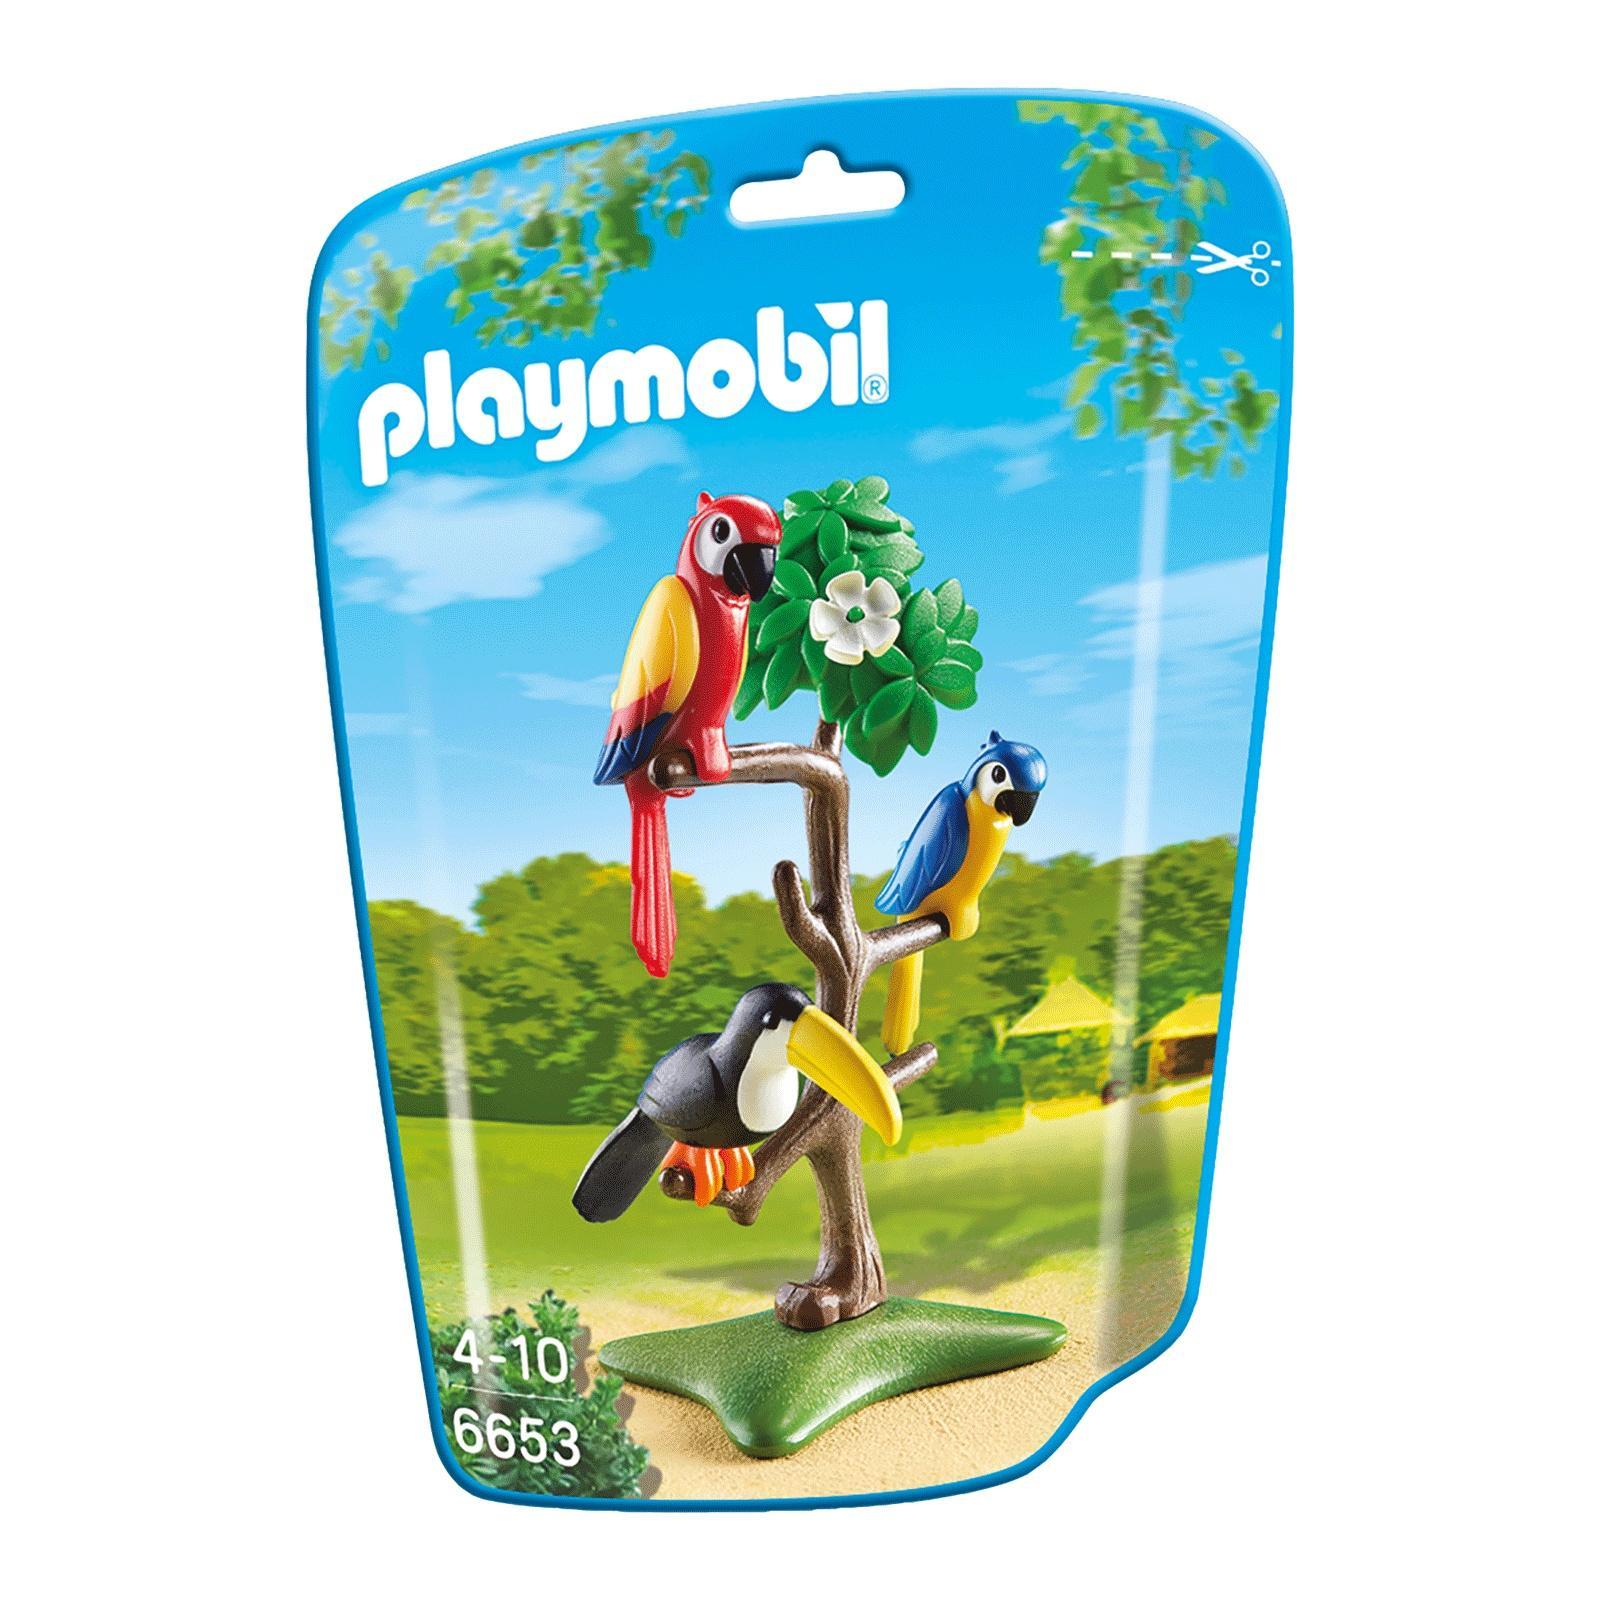 PLAYMOBIL 6653 Tropical Birds